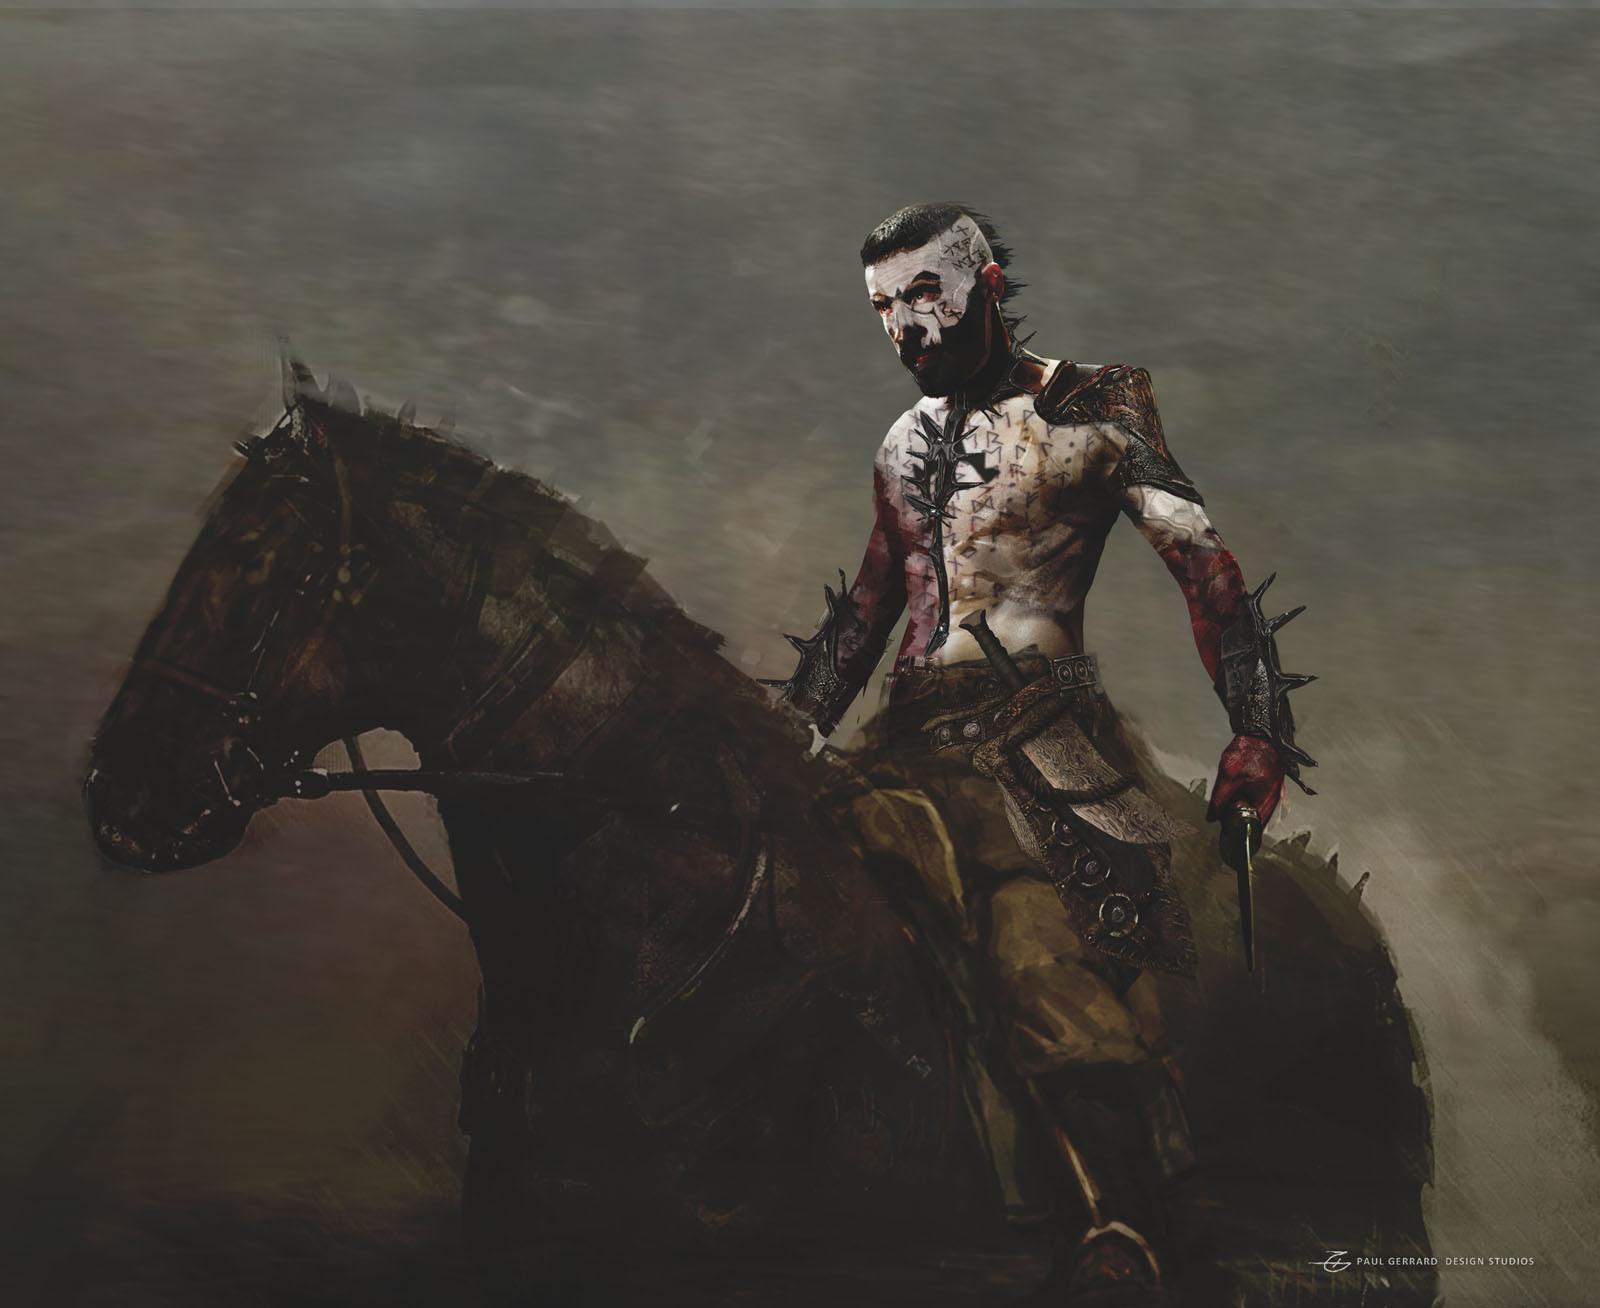 Paul gerrard wraith horde 04